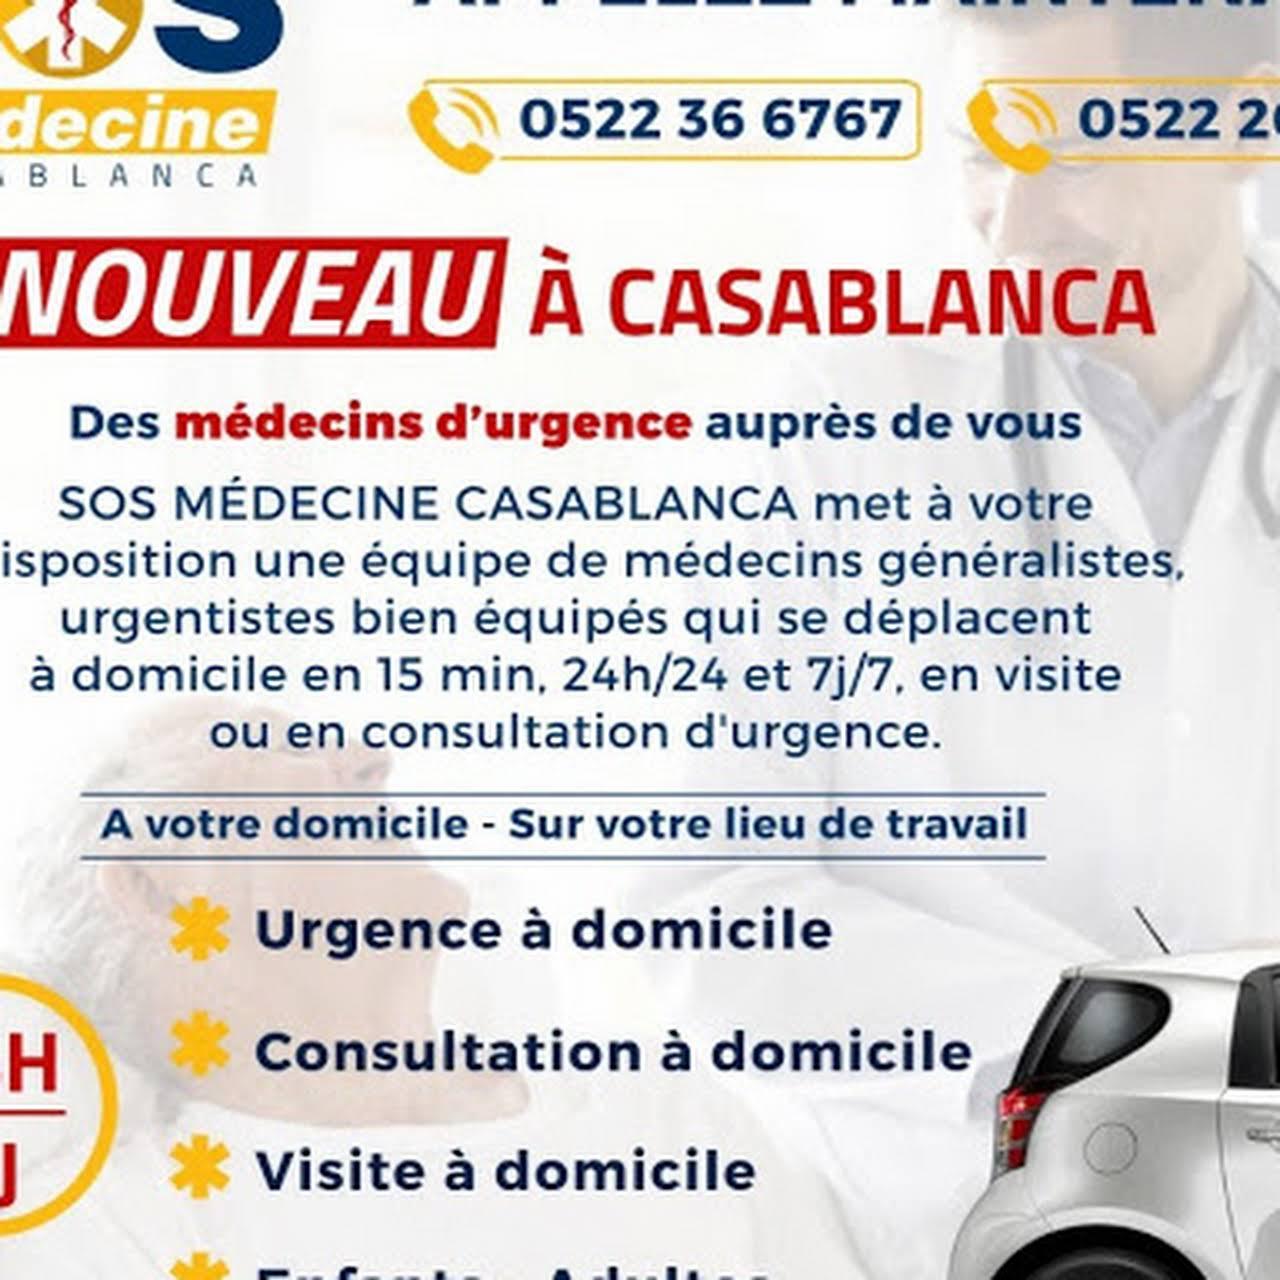 SOS MEDECIN - Sos Medecin Casablanca Maroc - TARIF 9 DH